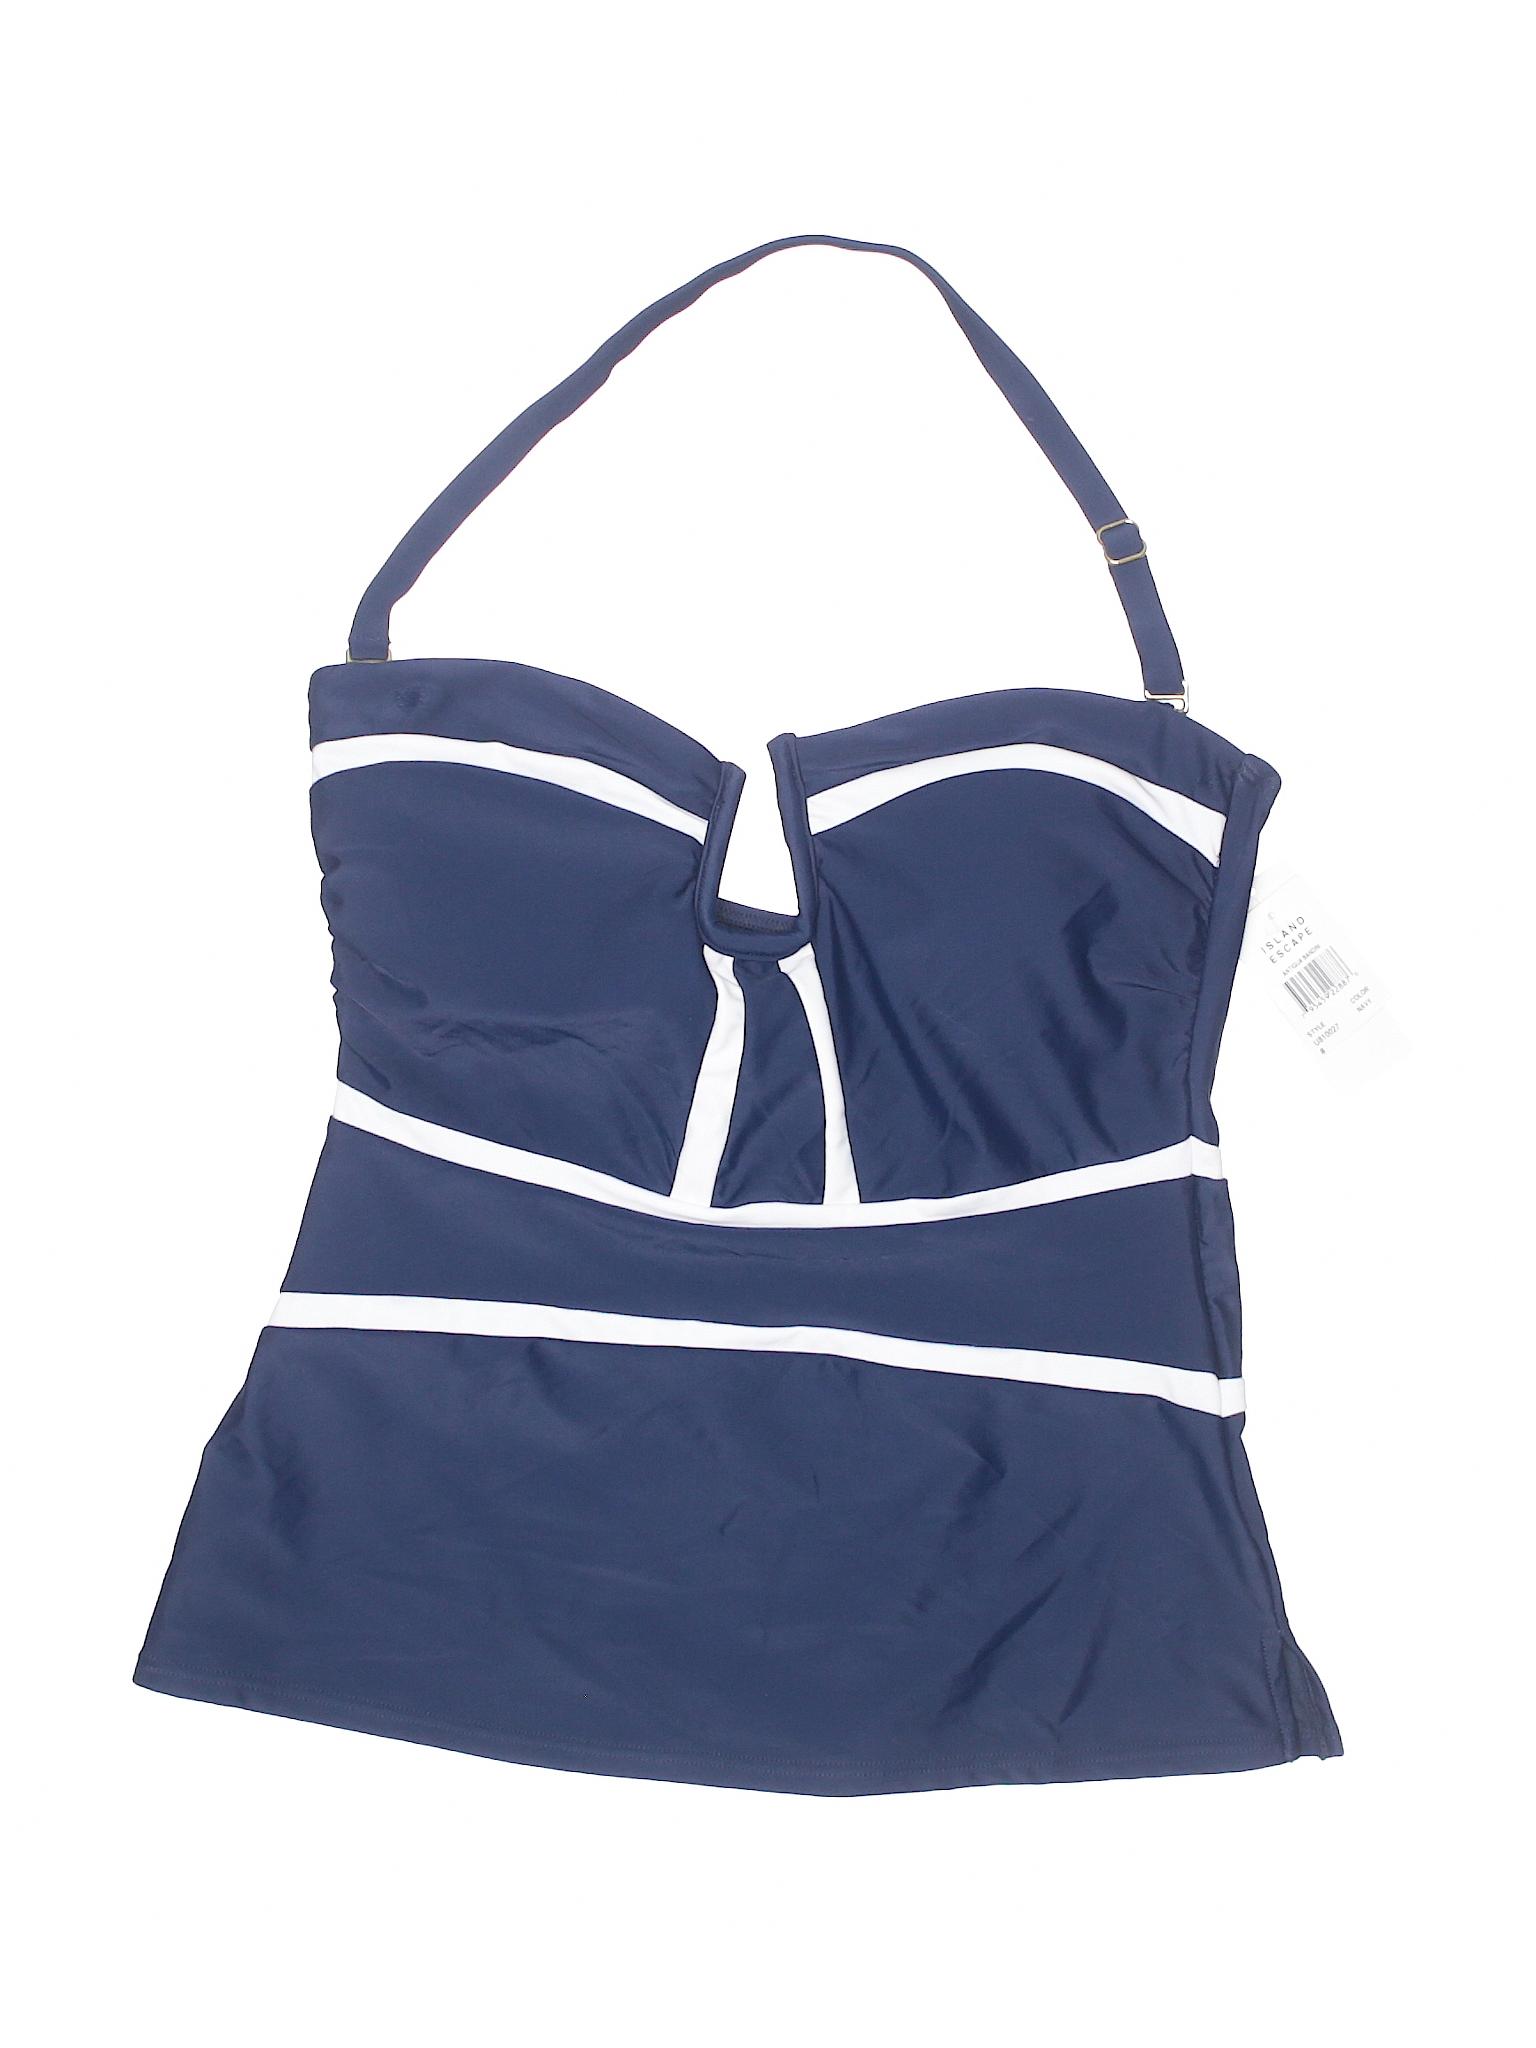 Island Boutique Swimsuit Escape Top Island Escape Boutique Top Swimsuit Boutique Island XPqEn7xw